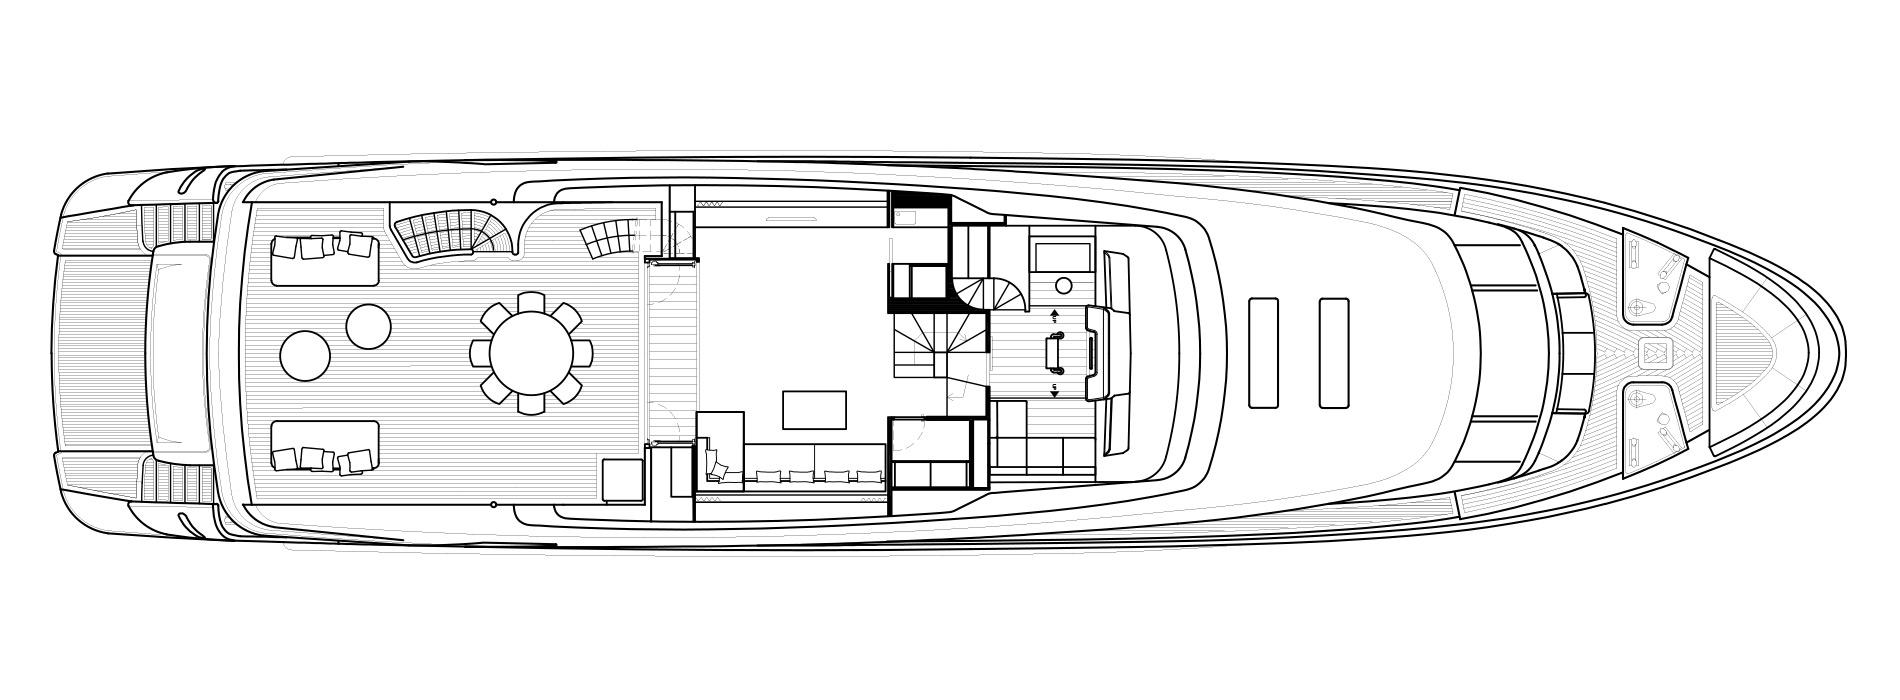 Sanlorenzo Yachts SD112 Oberdeck Versione A